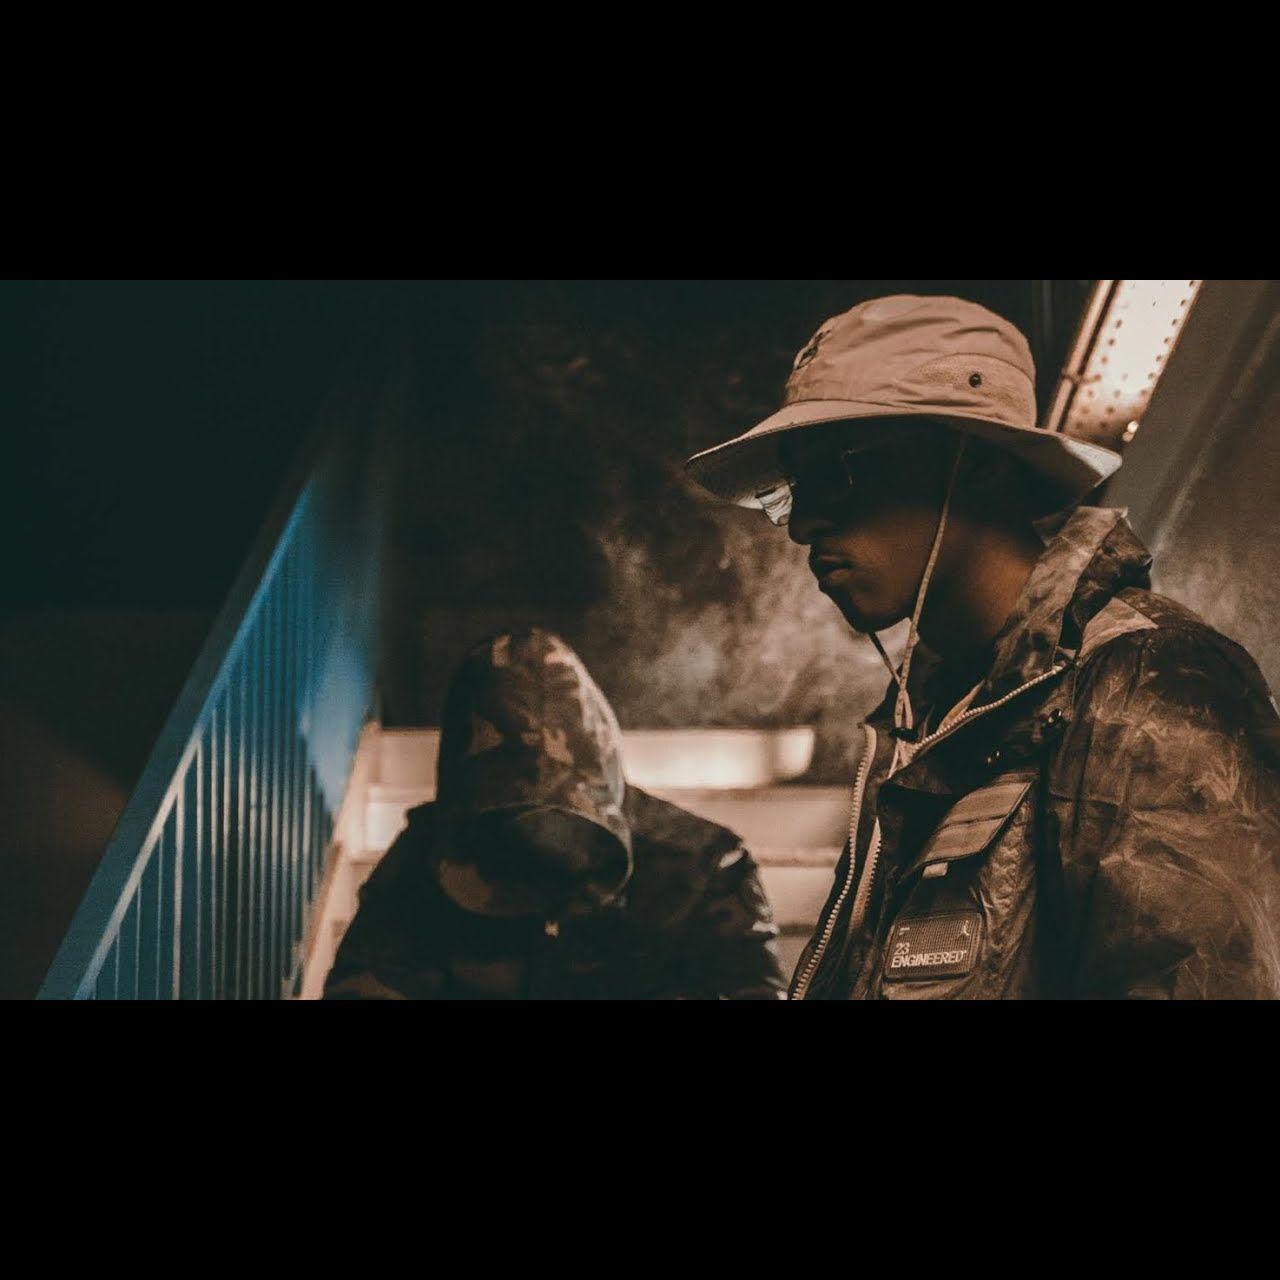 Nahir - Moneygram (ft. Freeze Corleone) (Thumbnail)